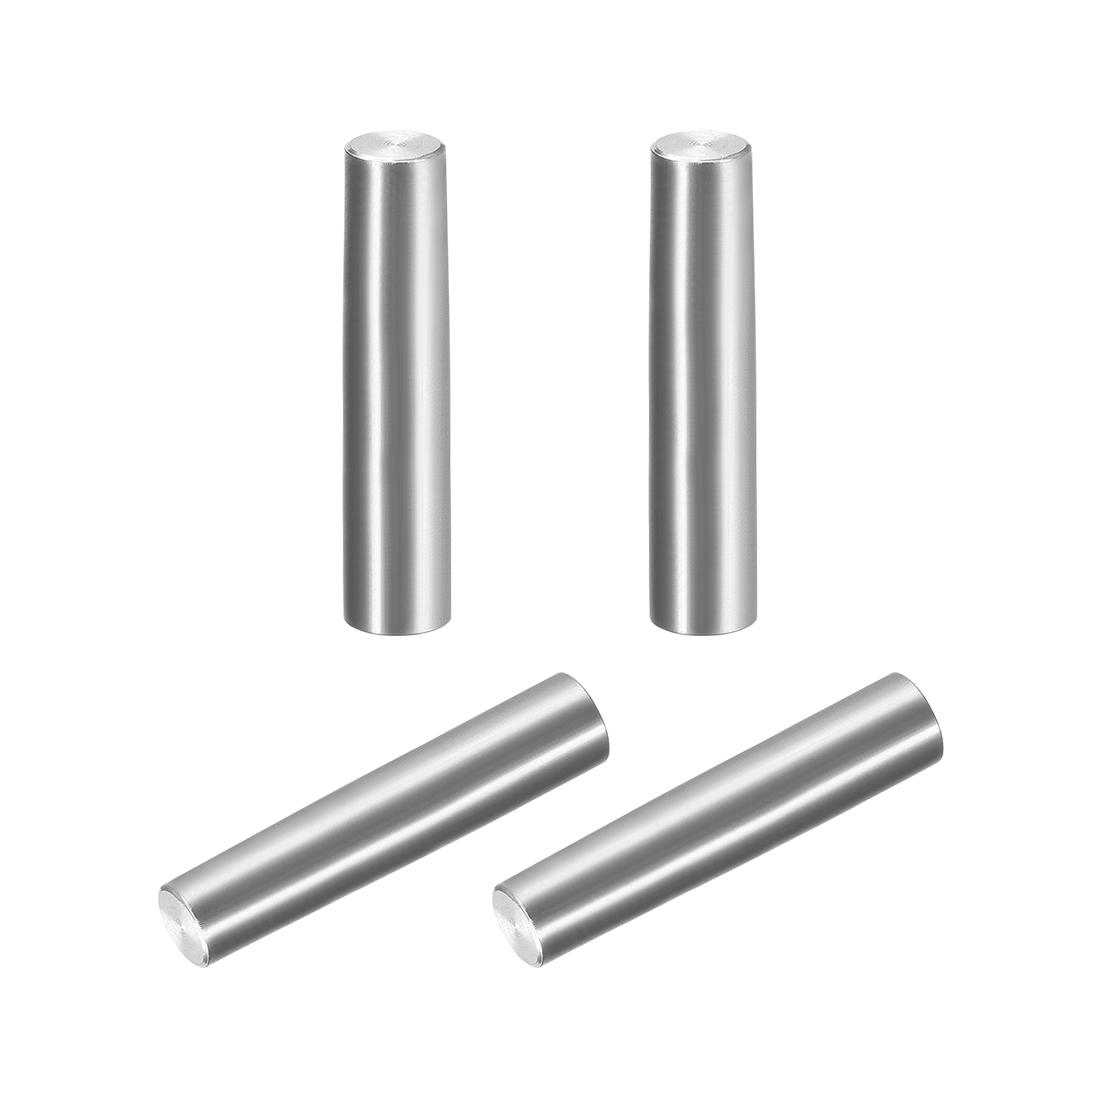 4Pcs 8mm x 40mm 1:50 Taper Pin 304 Stainless Steel Shelf Support Pin Fasten